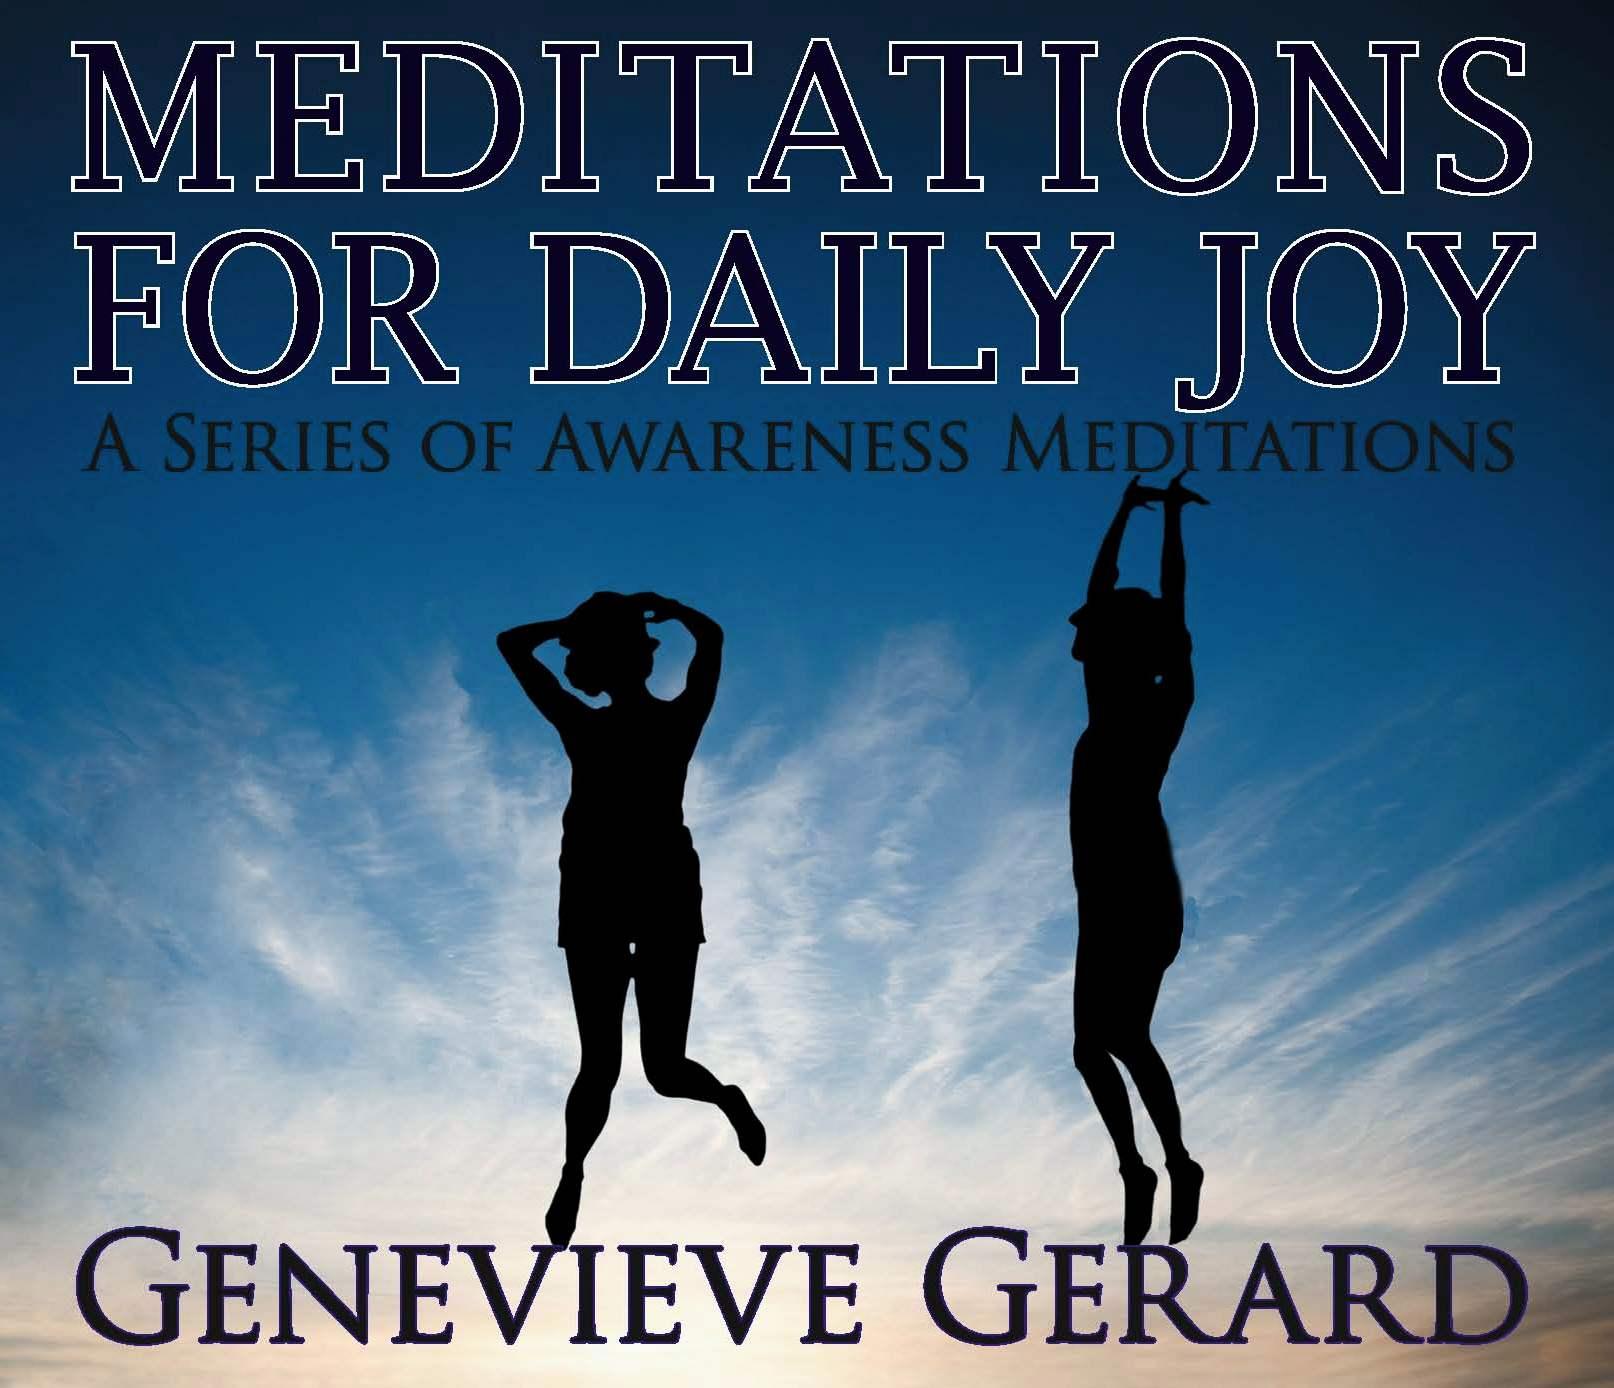 A Series of Awareness Meditations